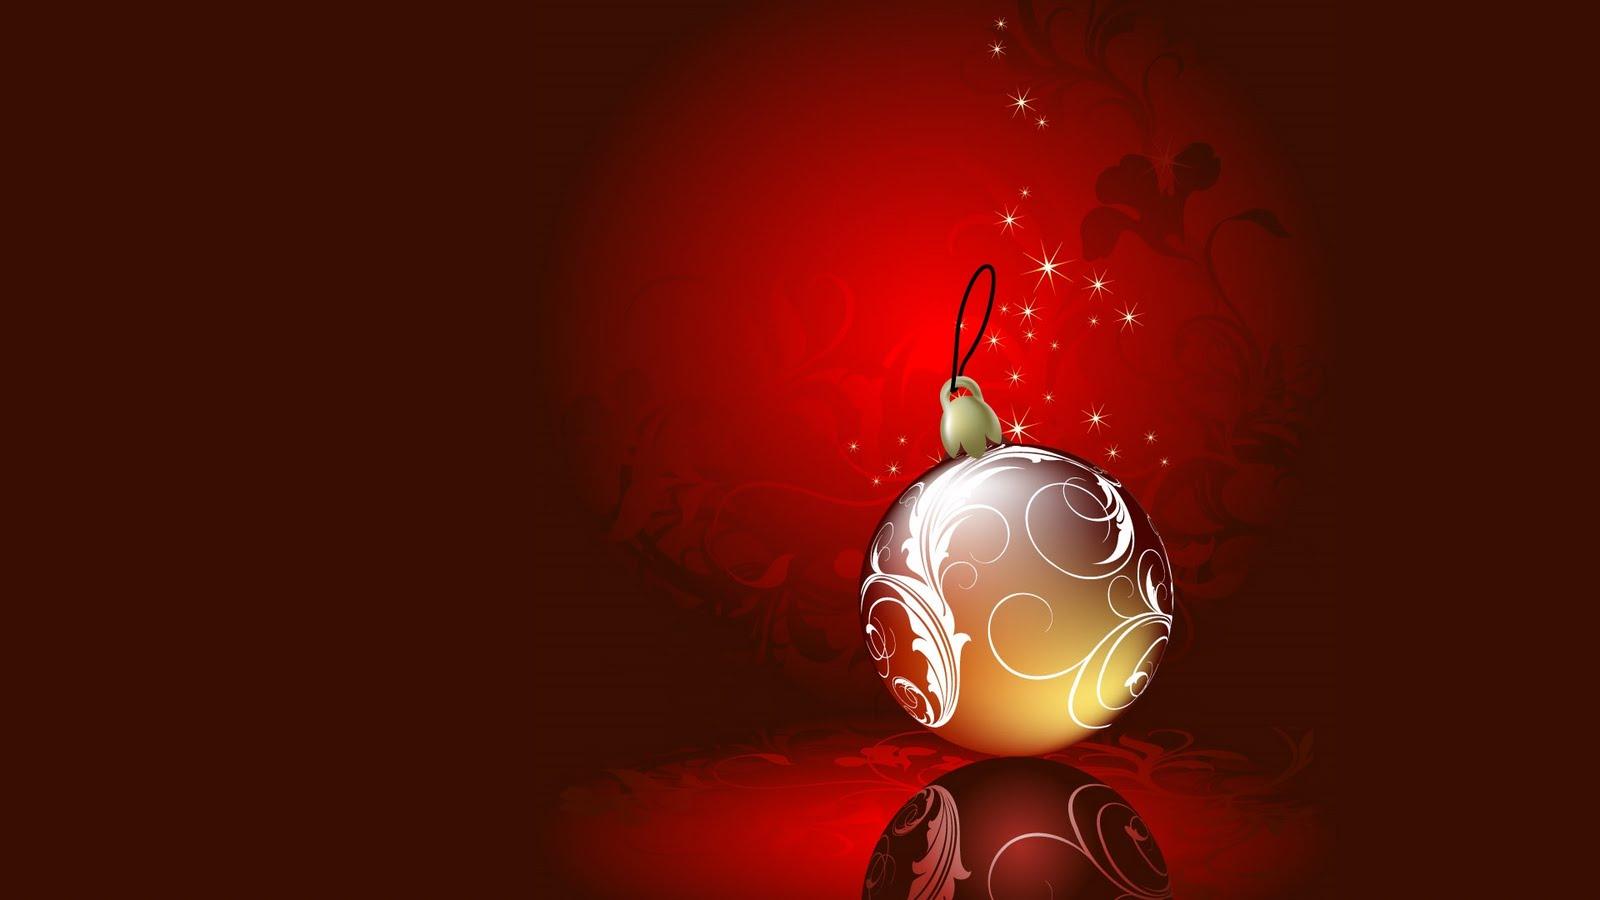 Christmas ball ornaments hd desktop wallpaper for Immagini divertenti desktop